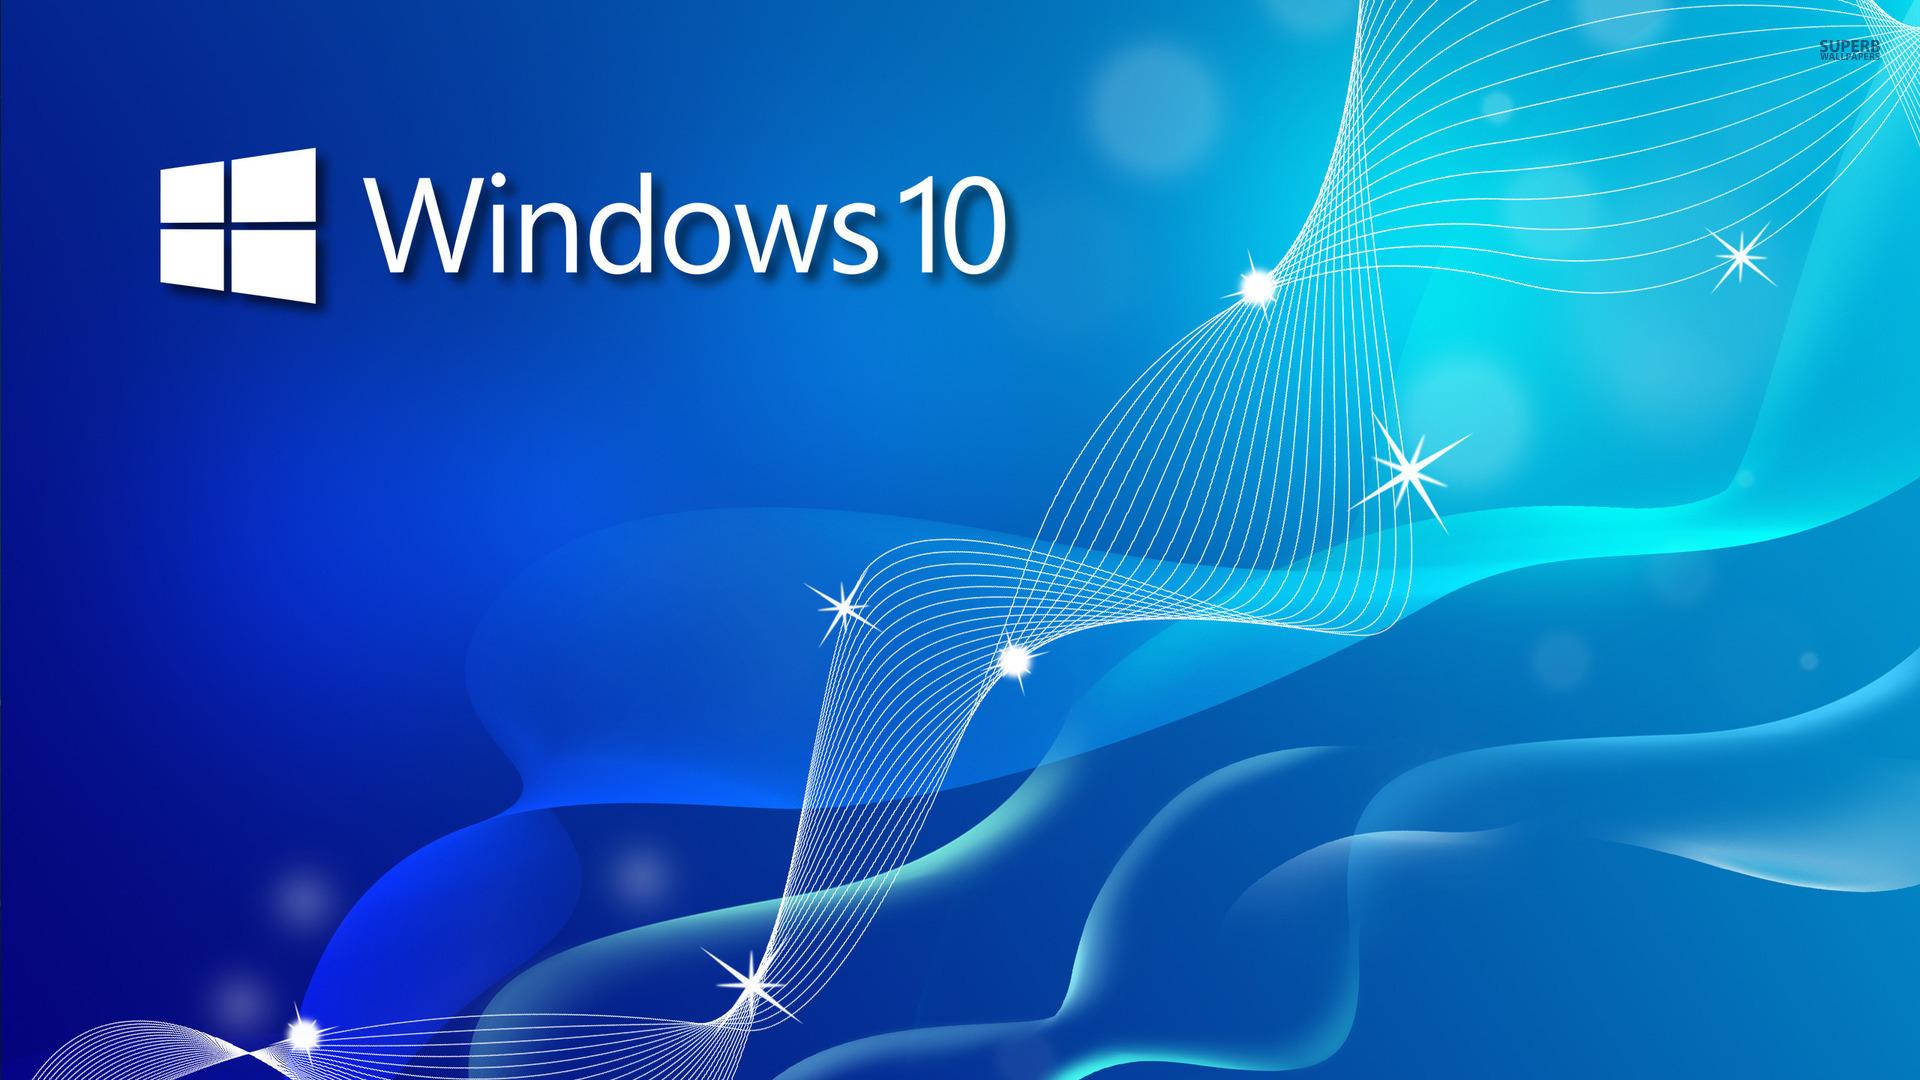 48 Windows 10 No Wallpaper On Wallpapersafari